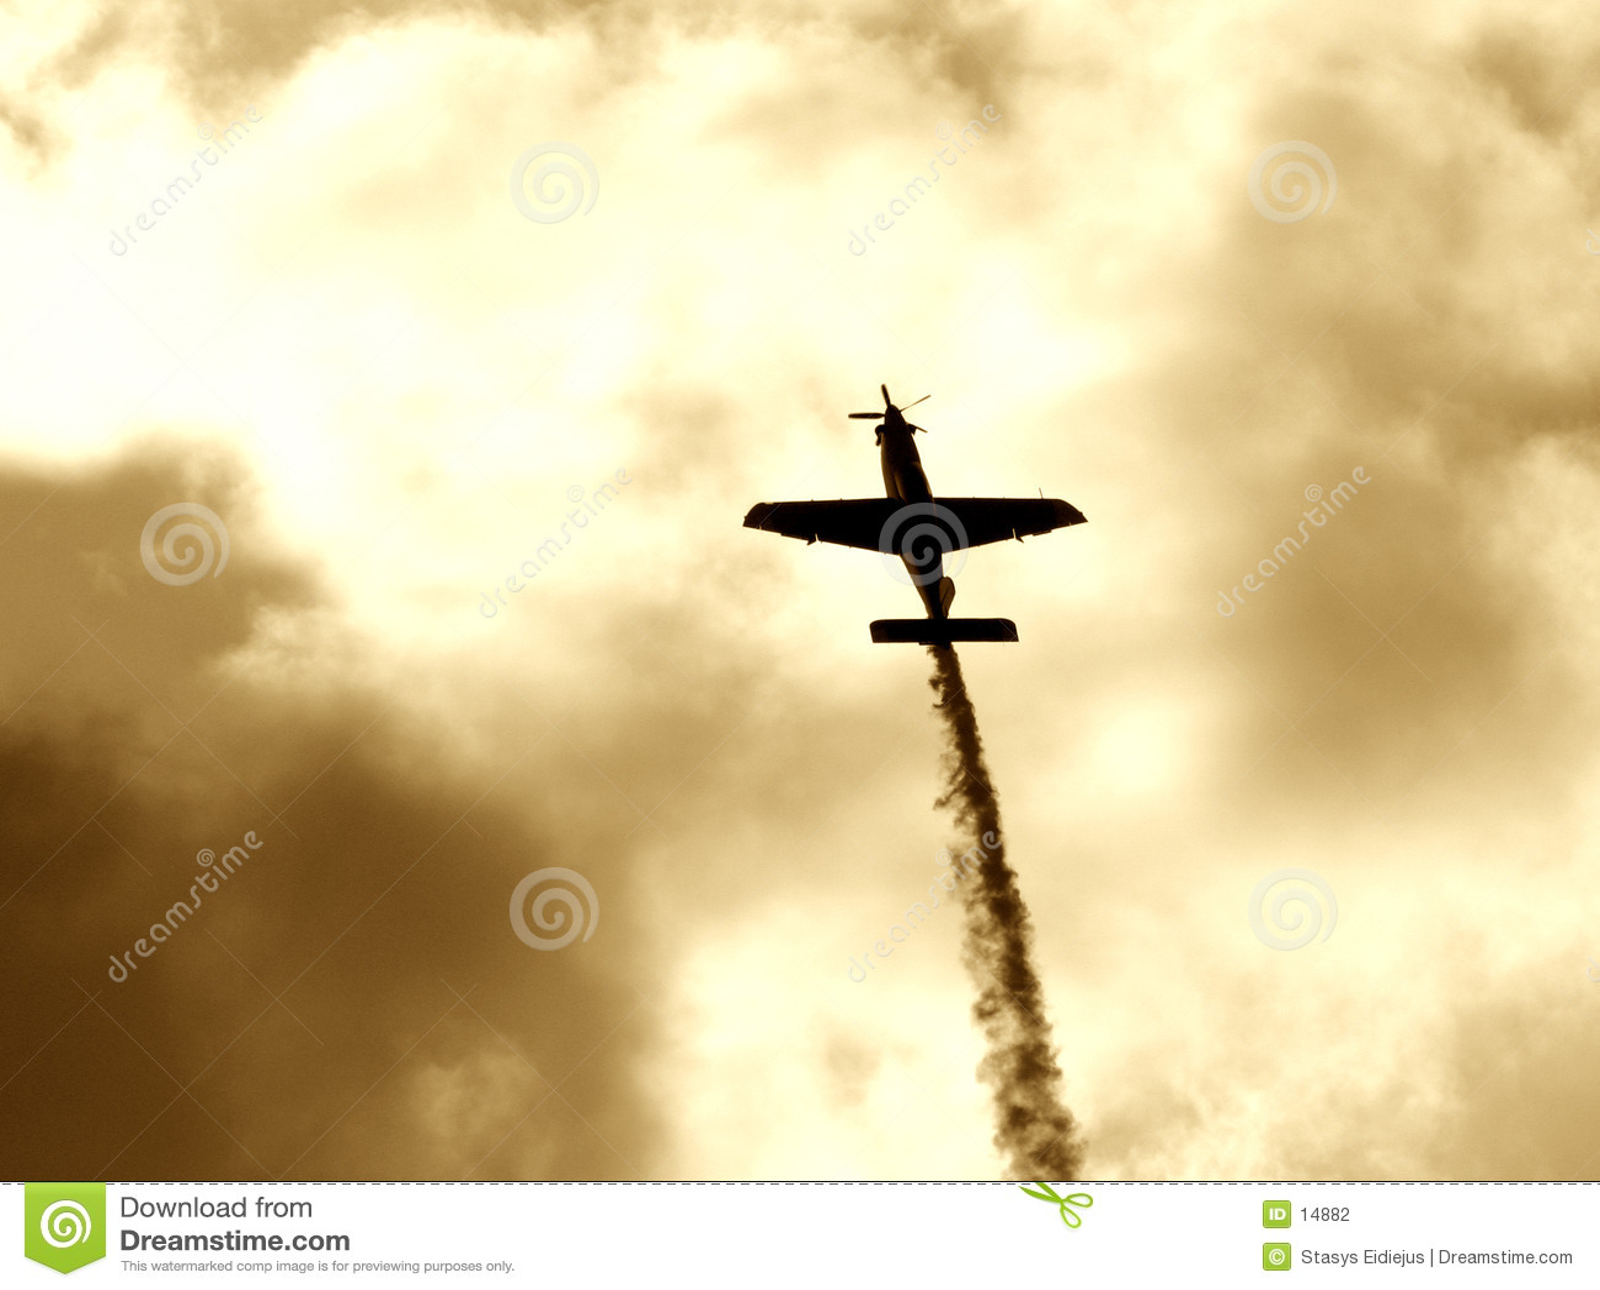 A plane making the smoke way II